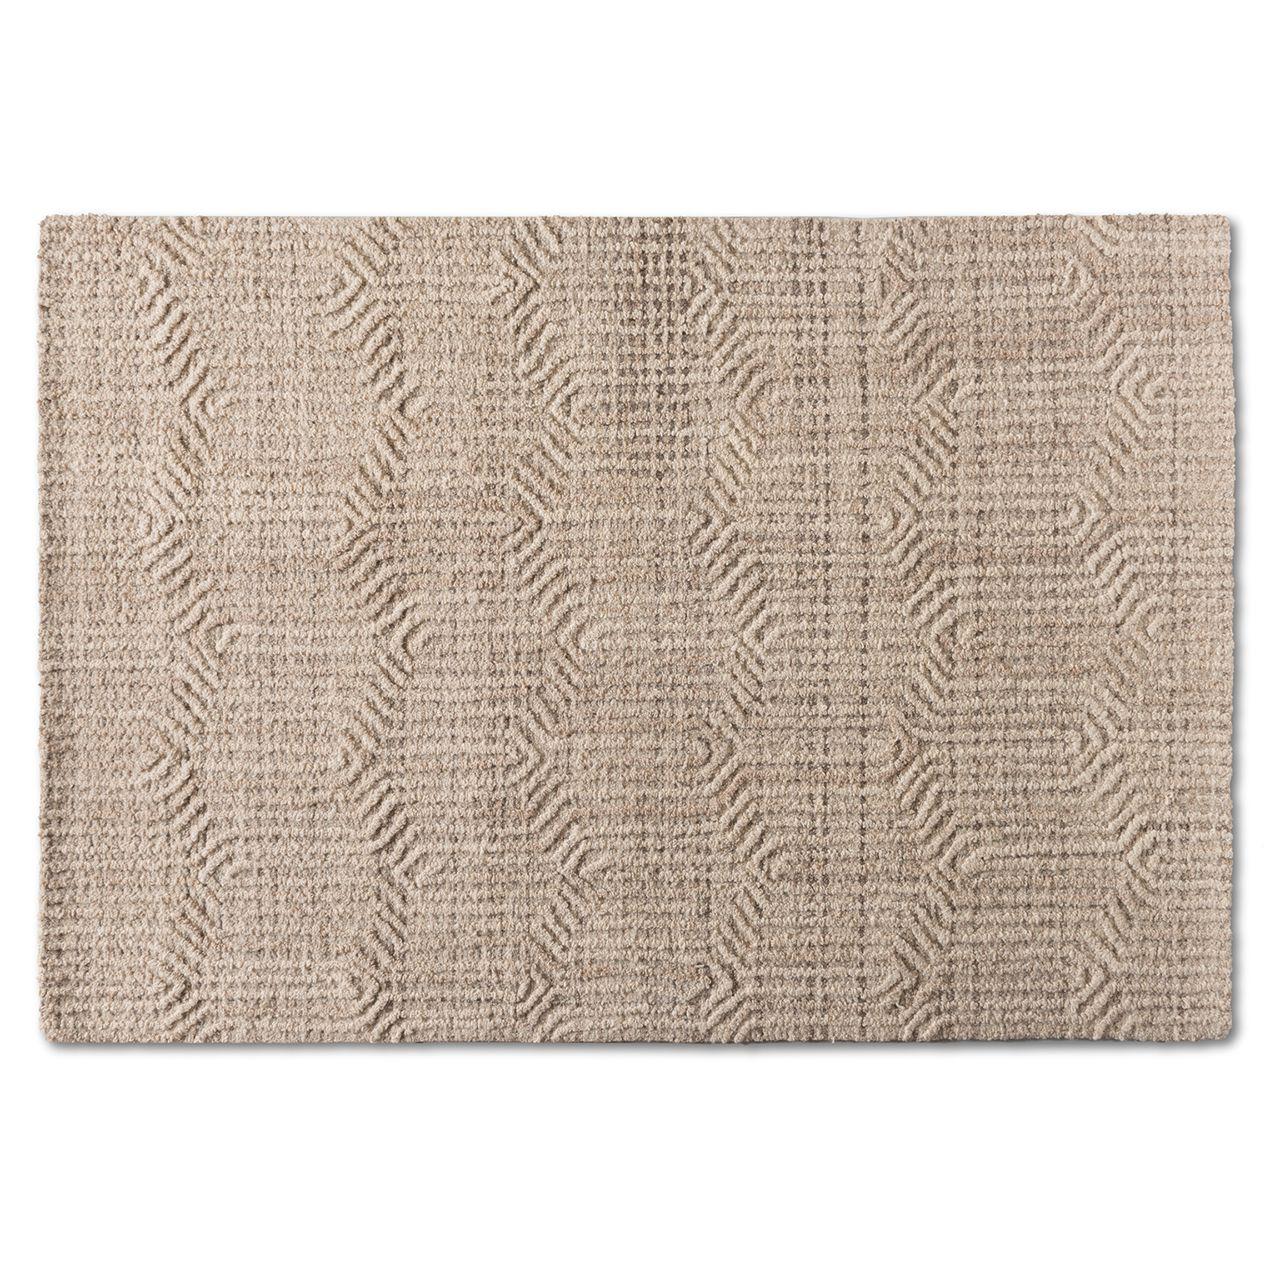 Baxton Studio Judian Ivory Handwoven Wool Area Rug